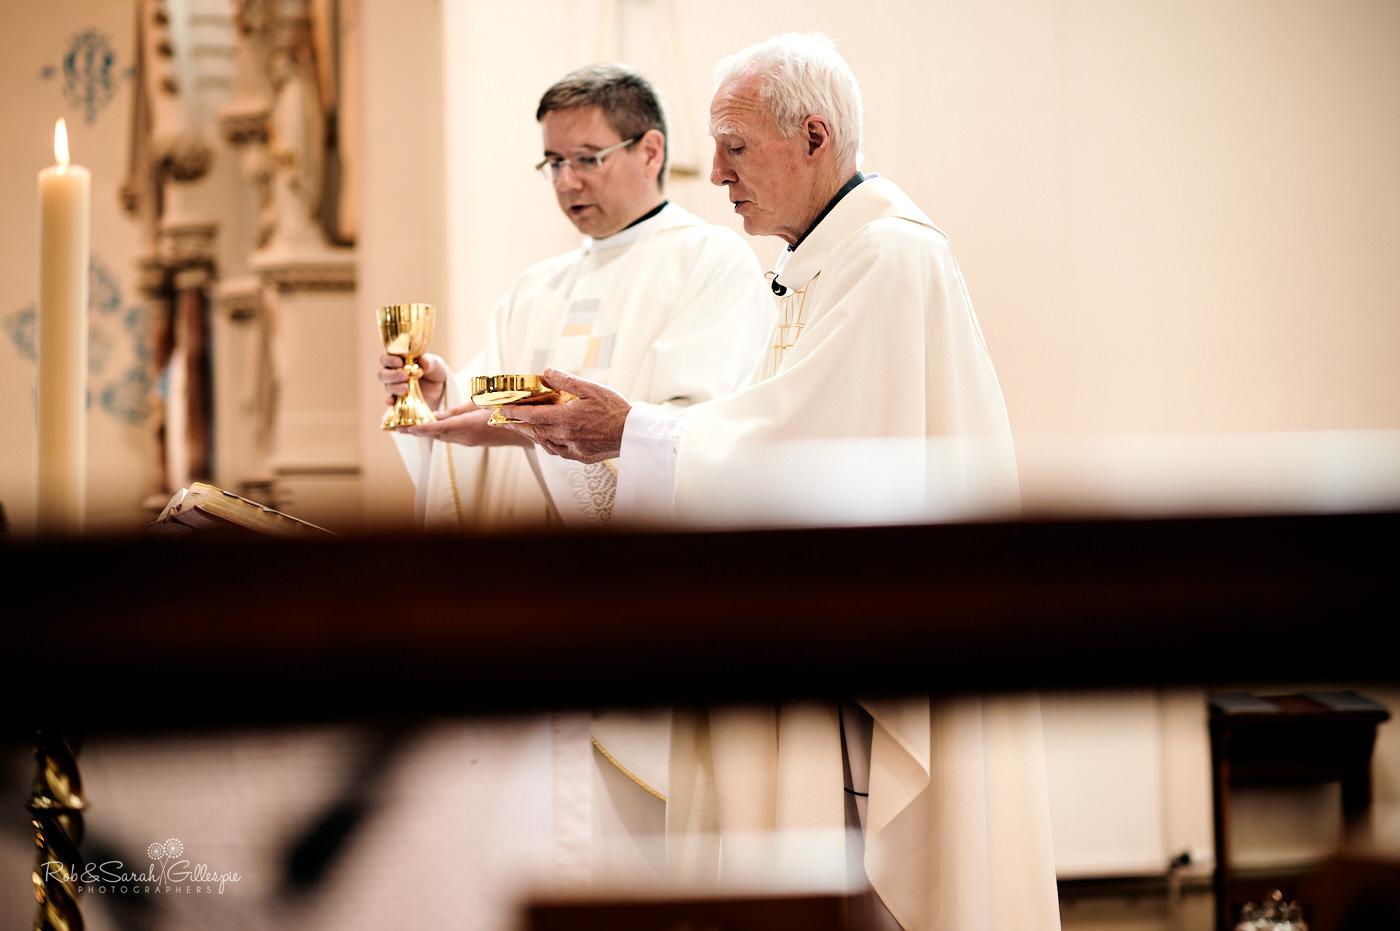 Catholic wedding ceremony at St Anne's church in Birmingham